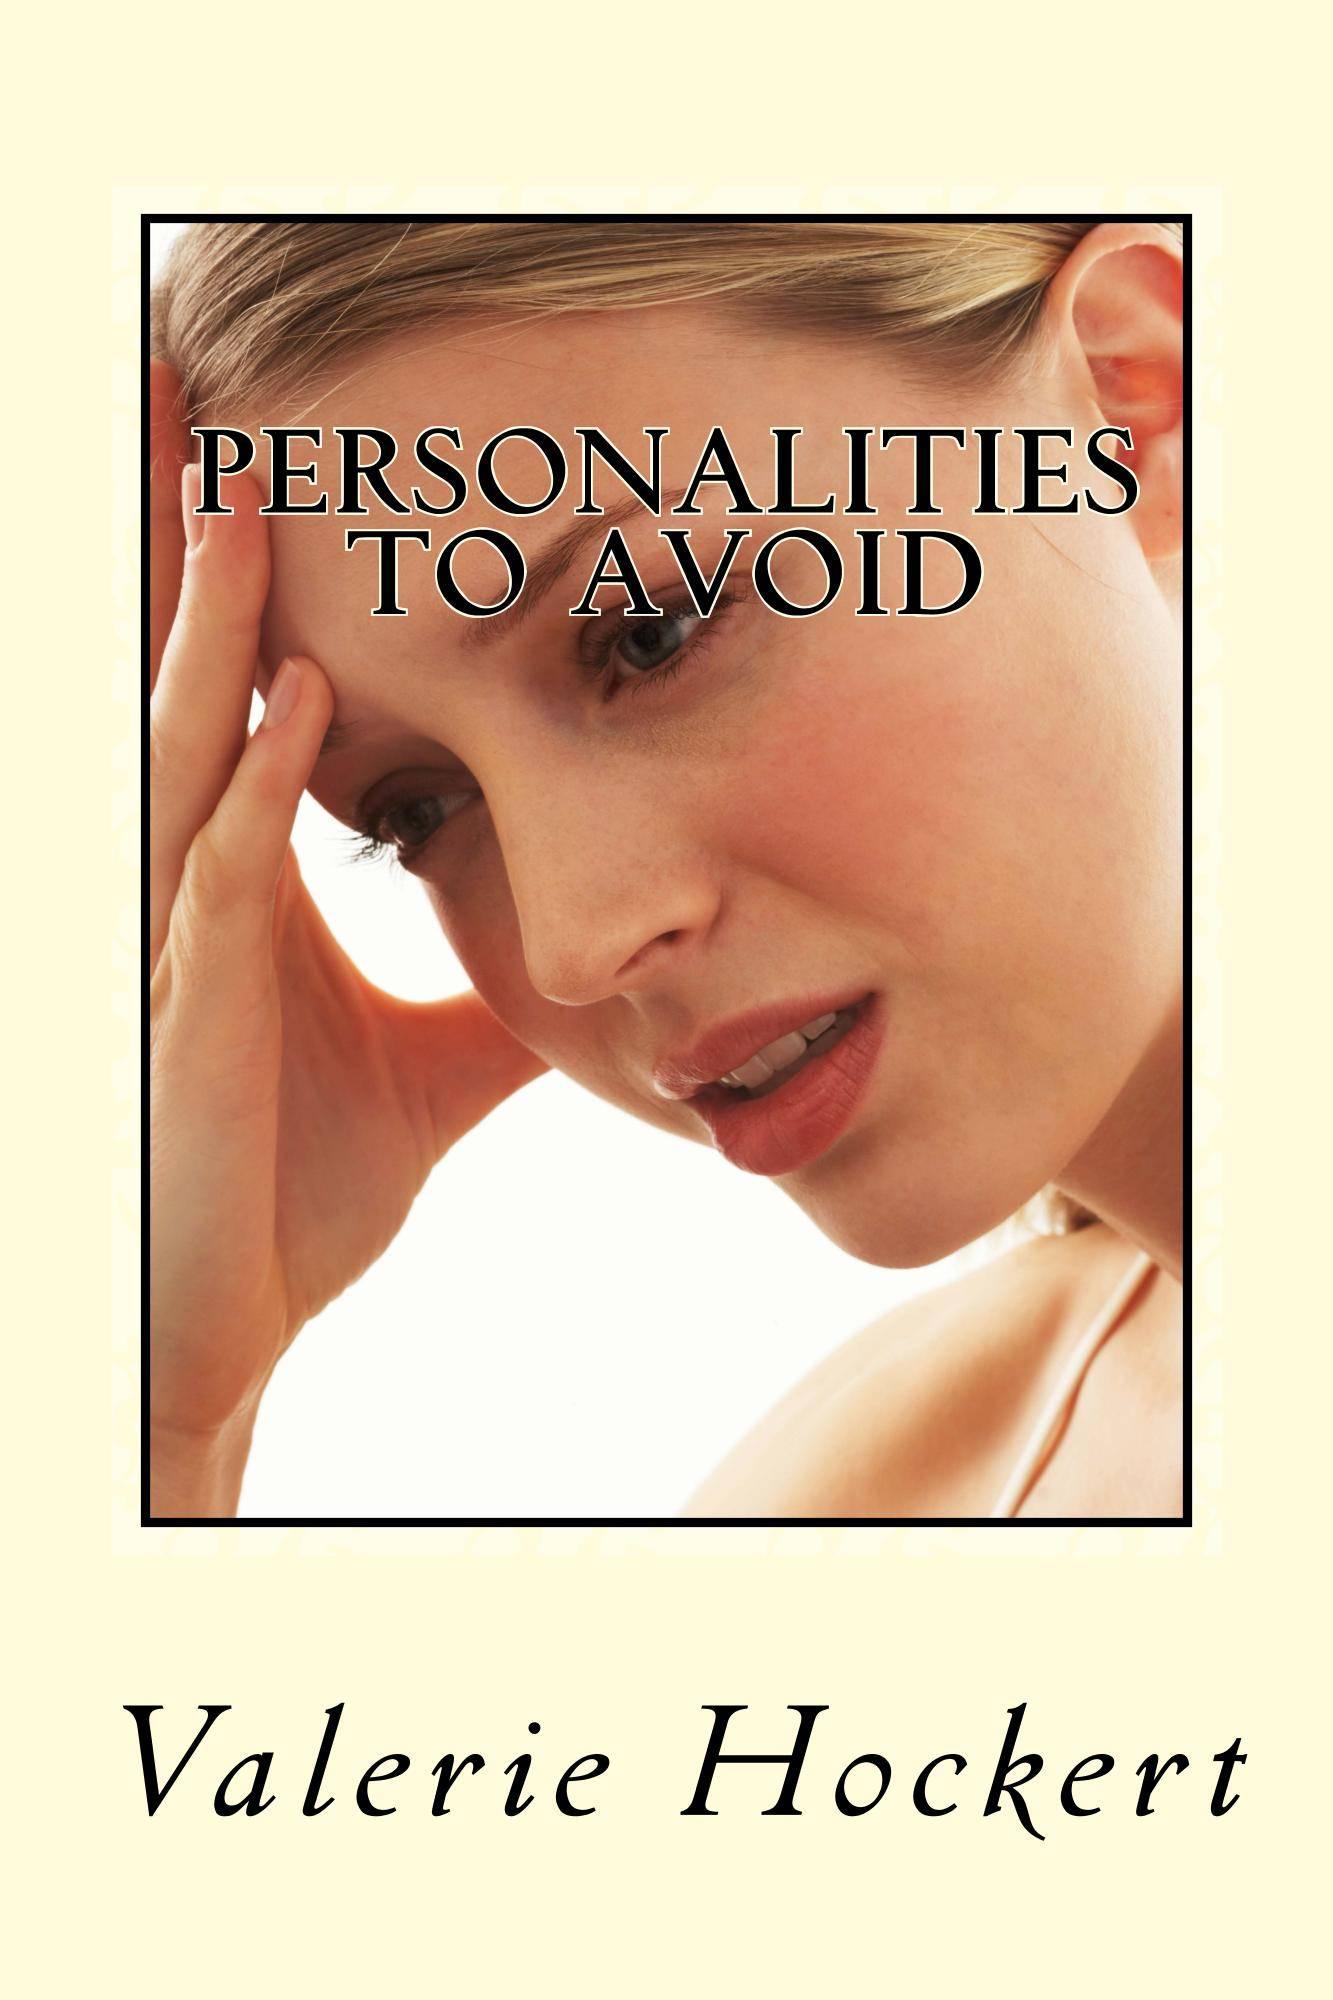 Personalities to avoid